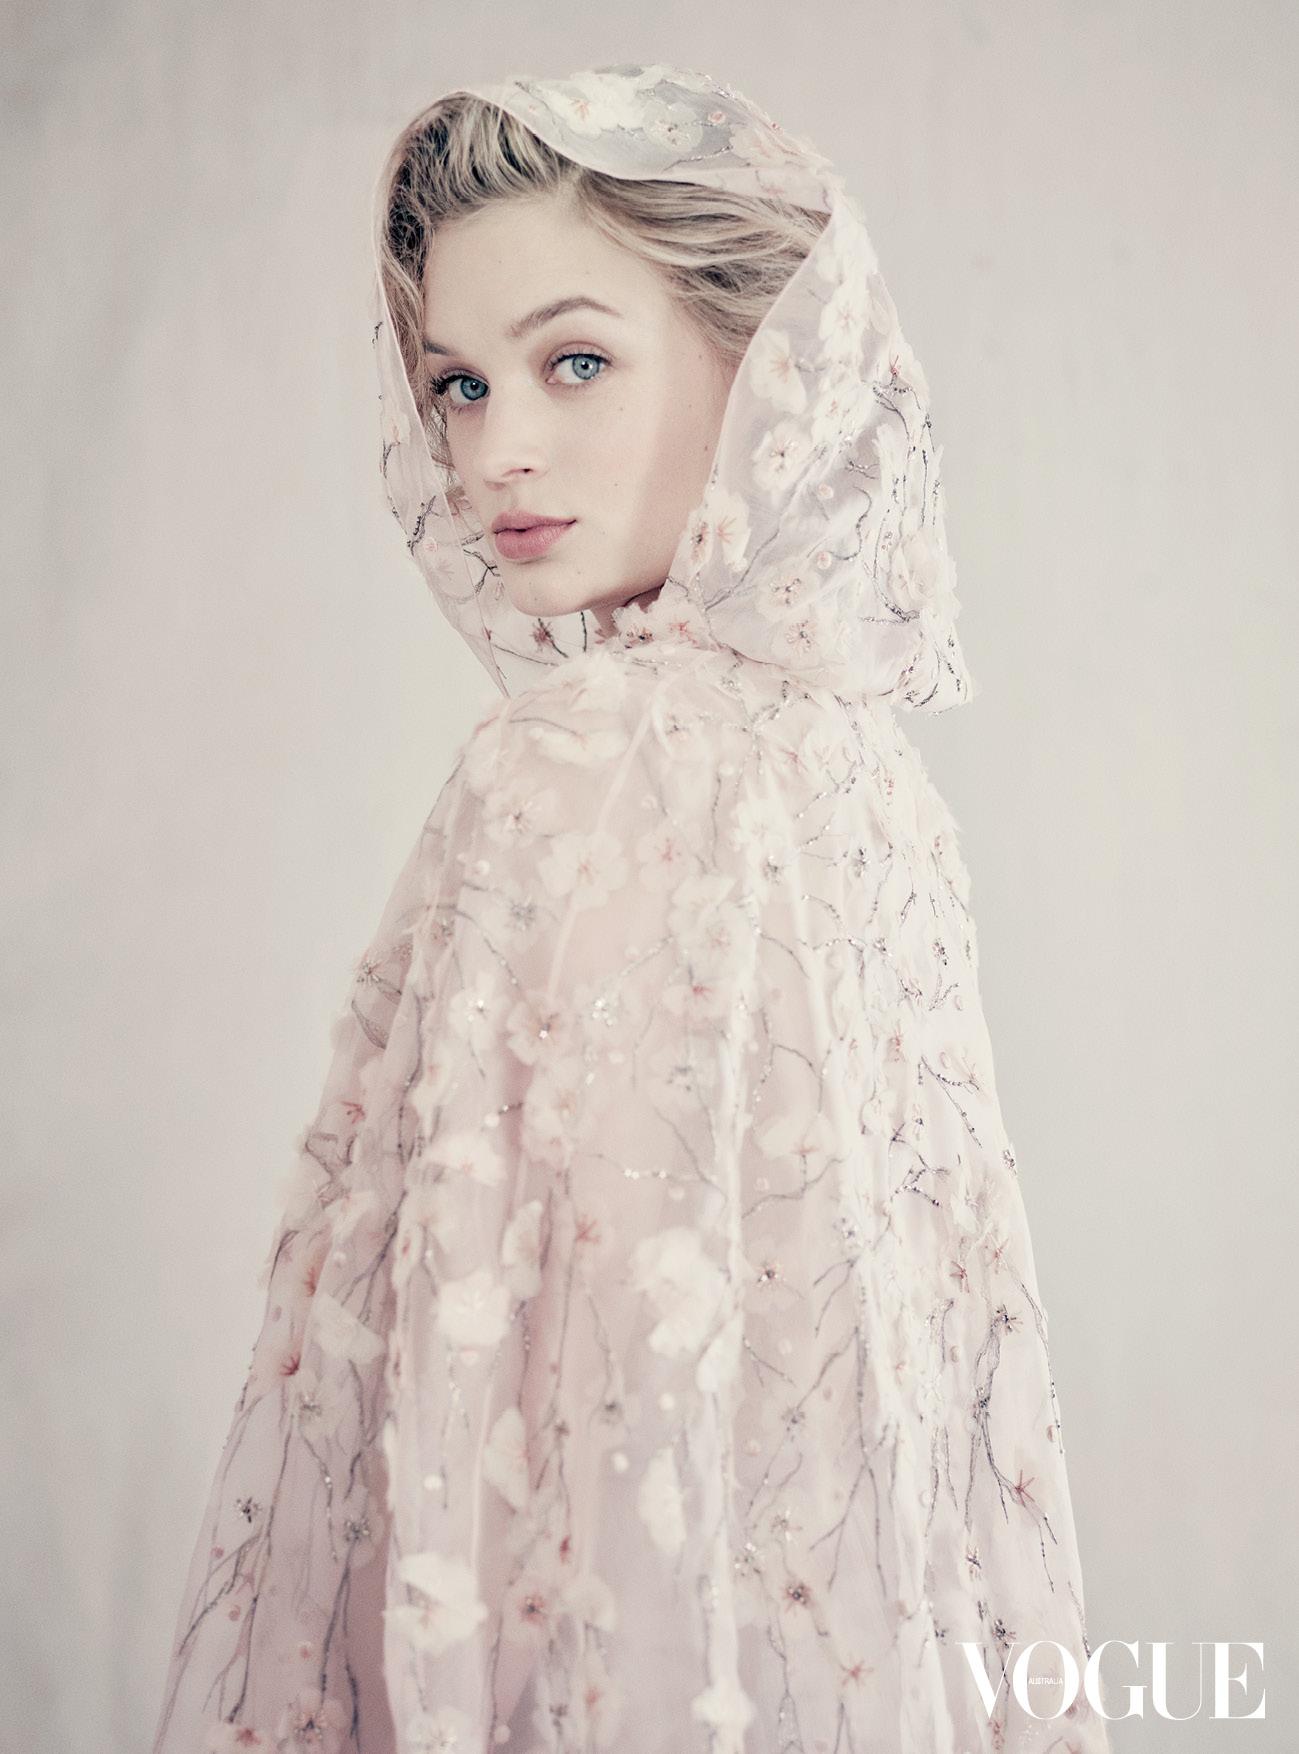 First Look Bella Heathcote Covers Vogue Australia S